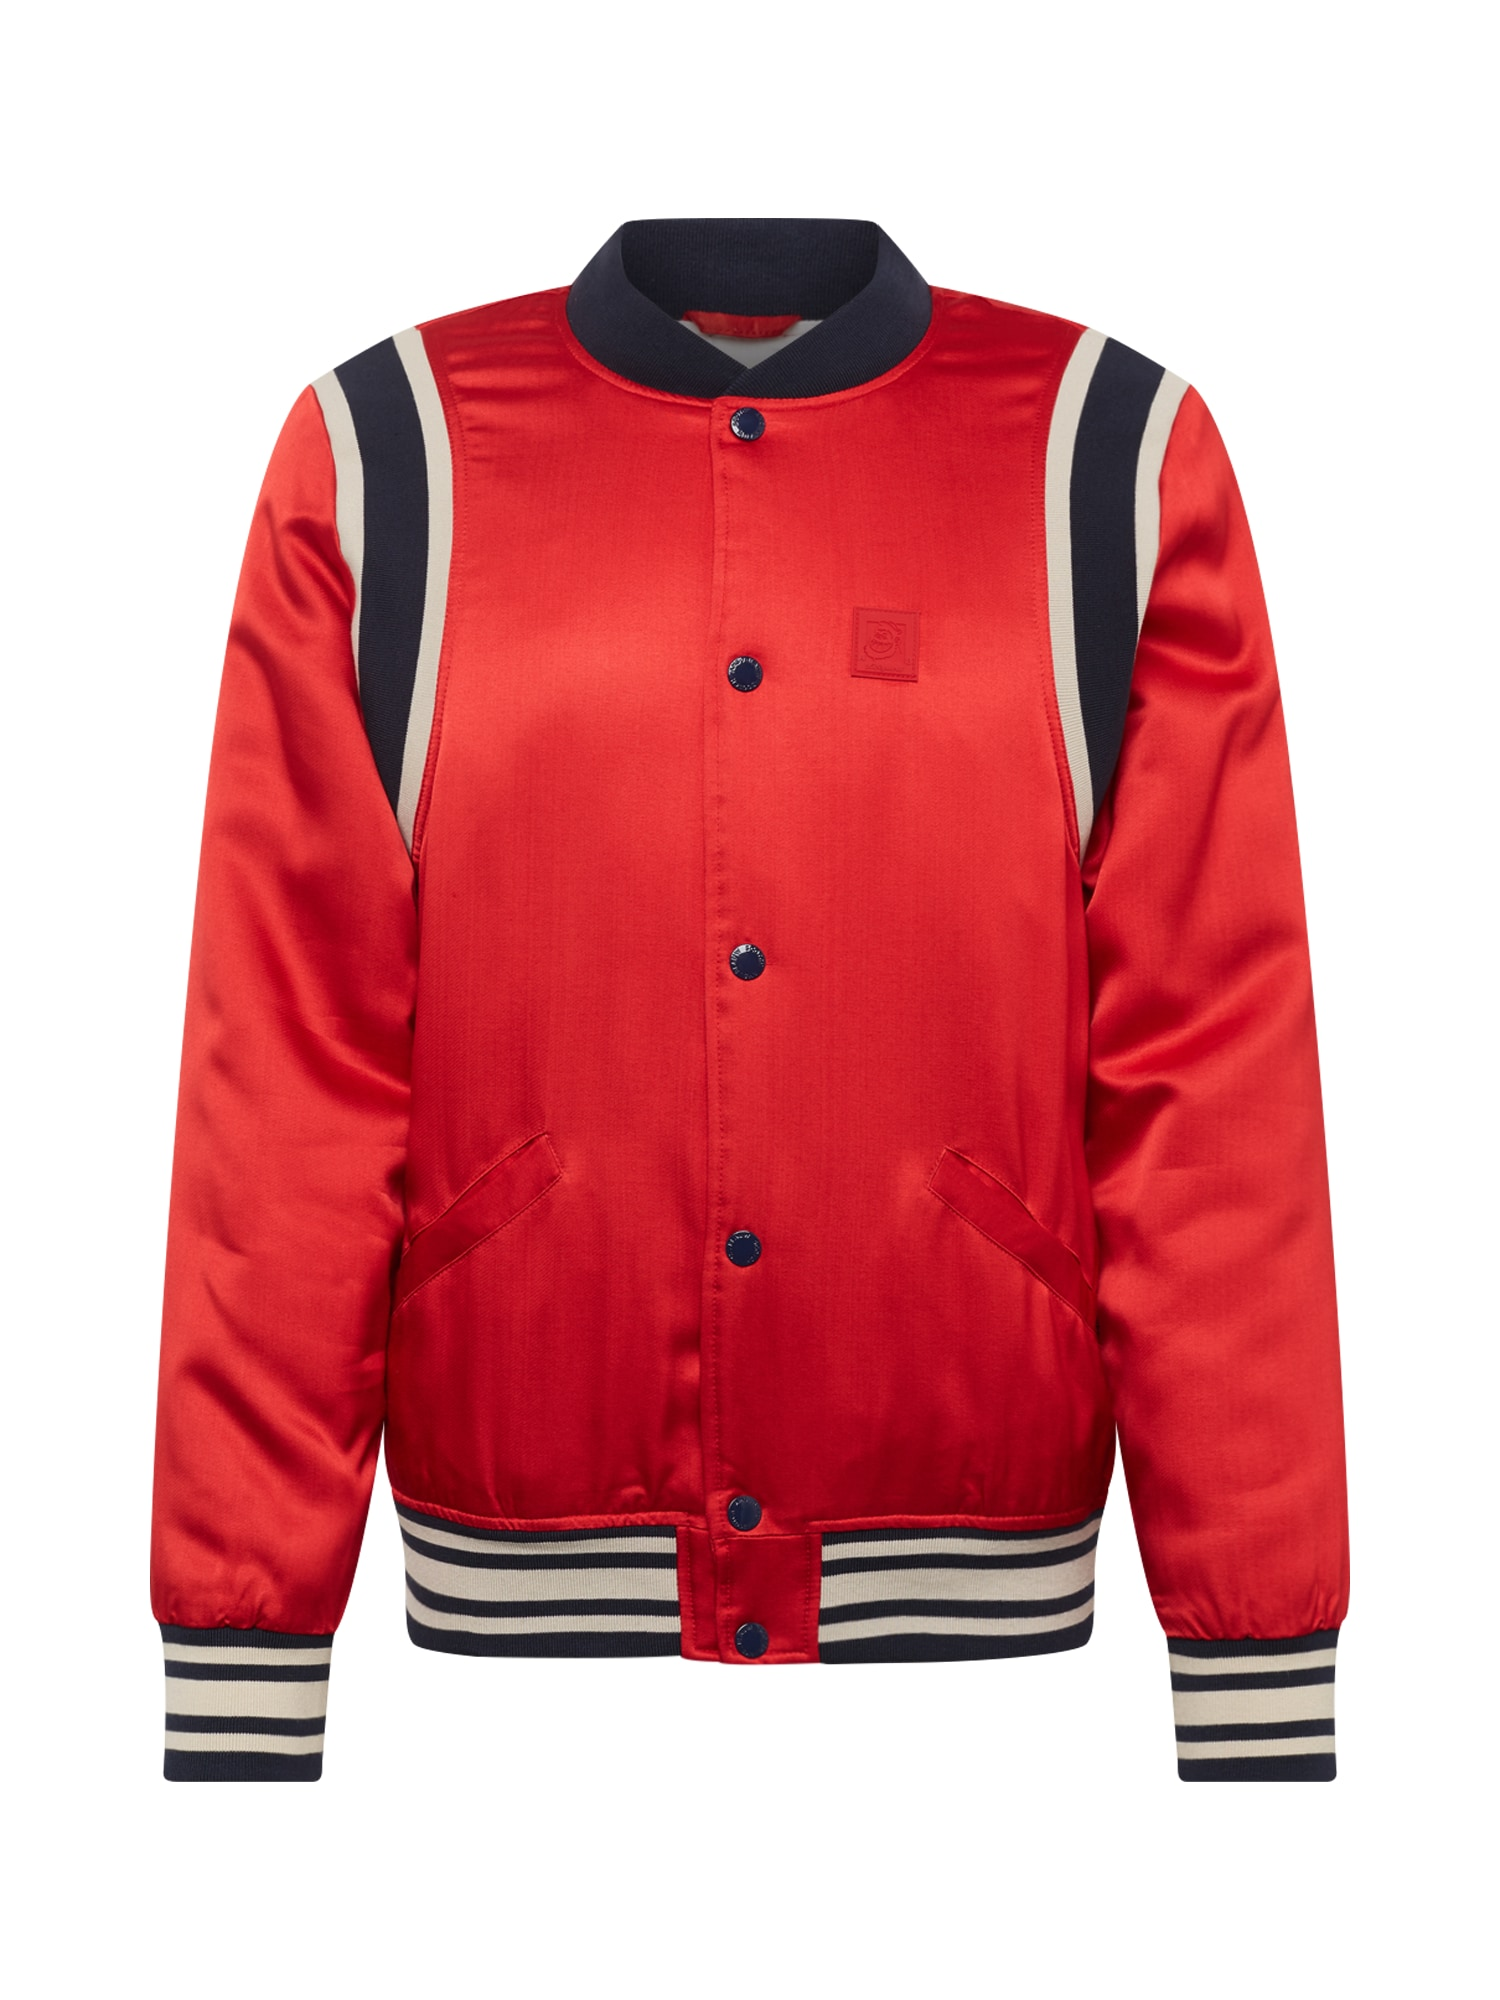 Přechodná bunda Brutus Ams Blauw colab červená černá bílá SCOTCH & SODA